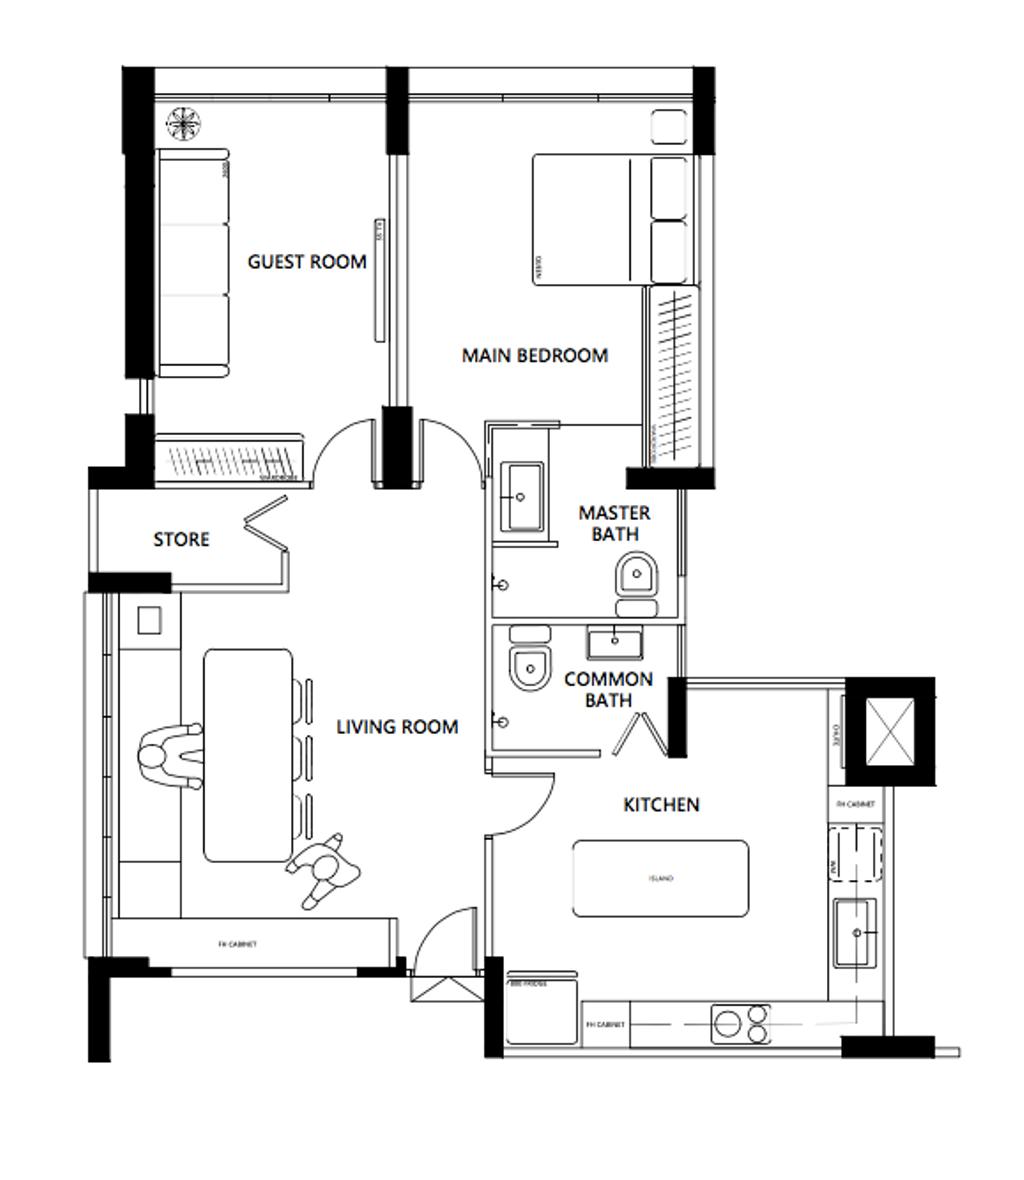 Contemporary, HDB, Potong Pasir Avenue 1, Interior Designer, KDOT, 3 Room Hdb Floorplan, Space Planning, Final Floorplan